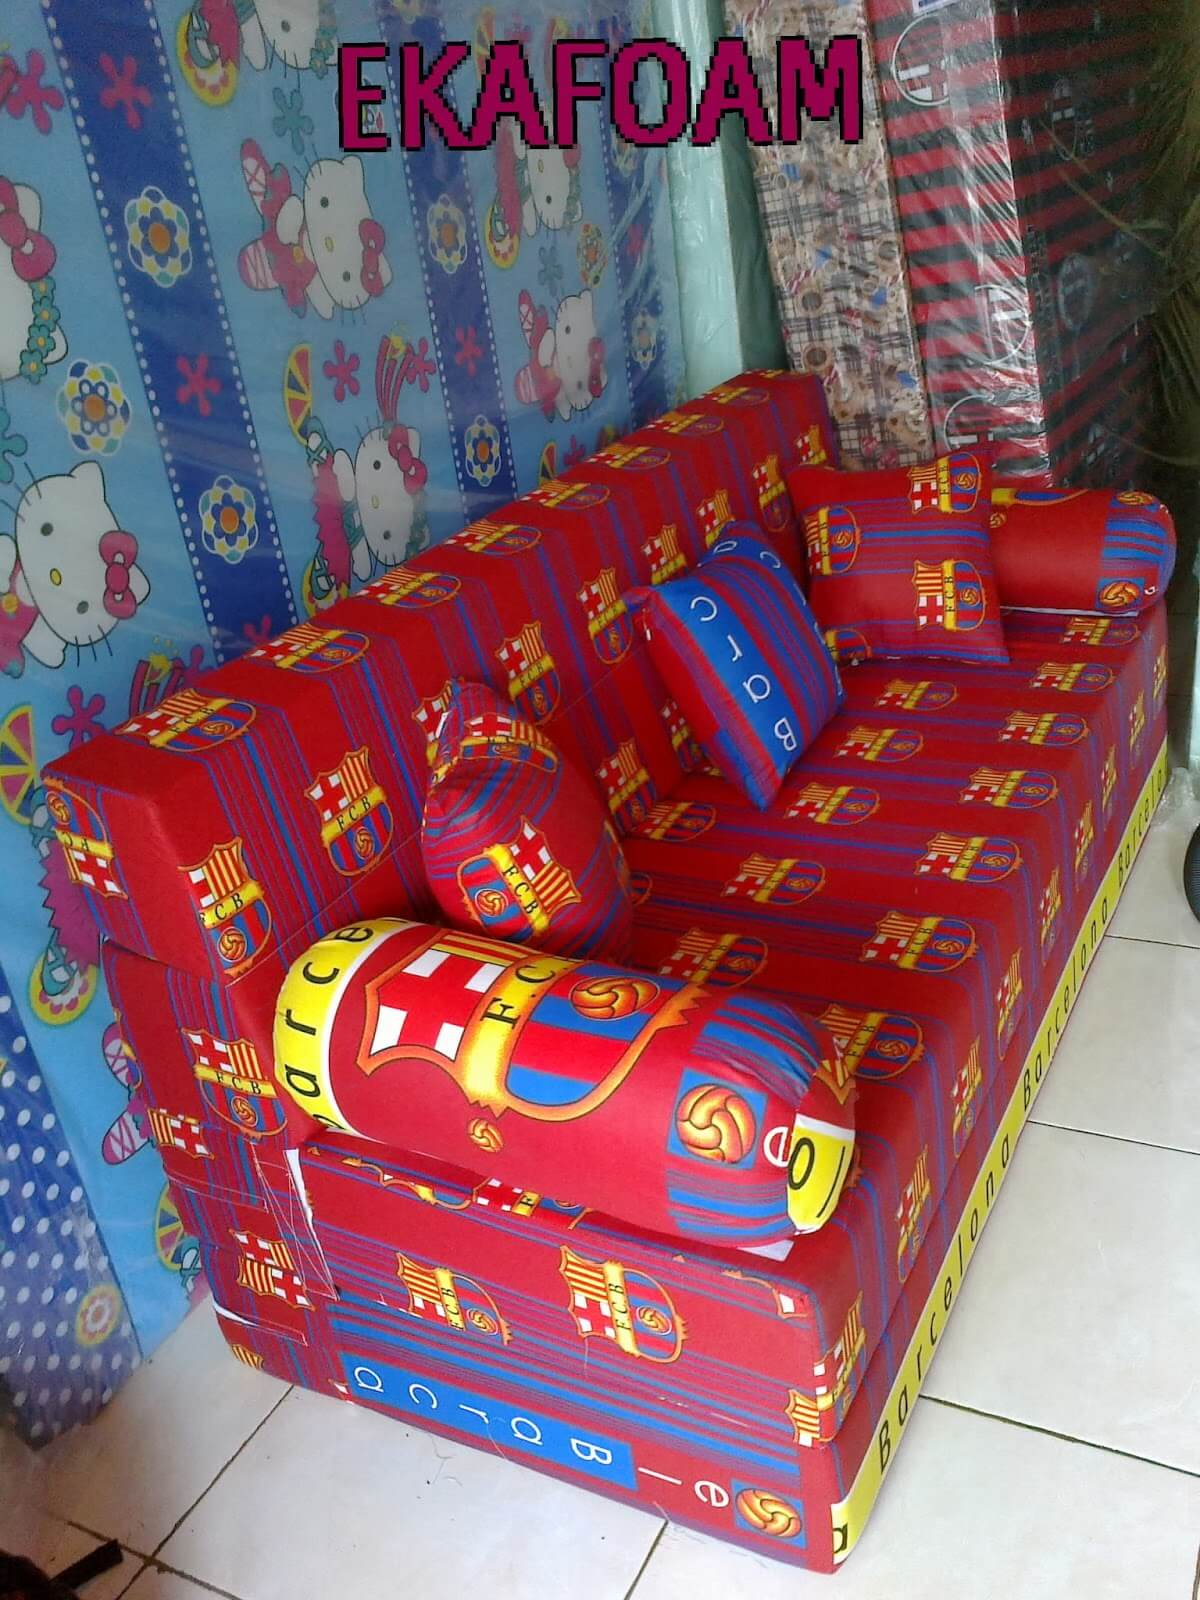 sofa bed inoac harga 2017 scandinavian malaysia full motif agen resmi kasur busa